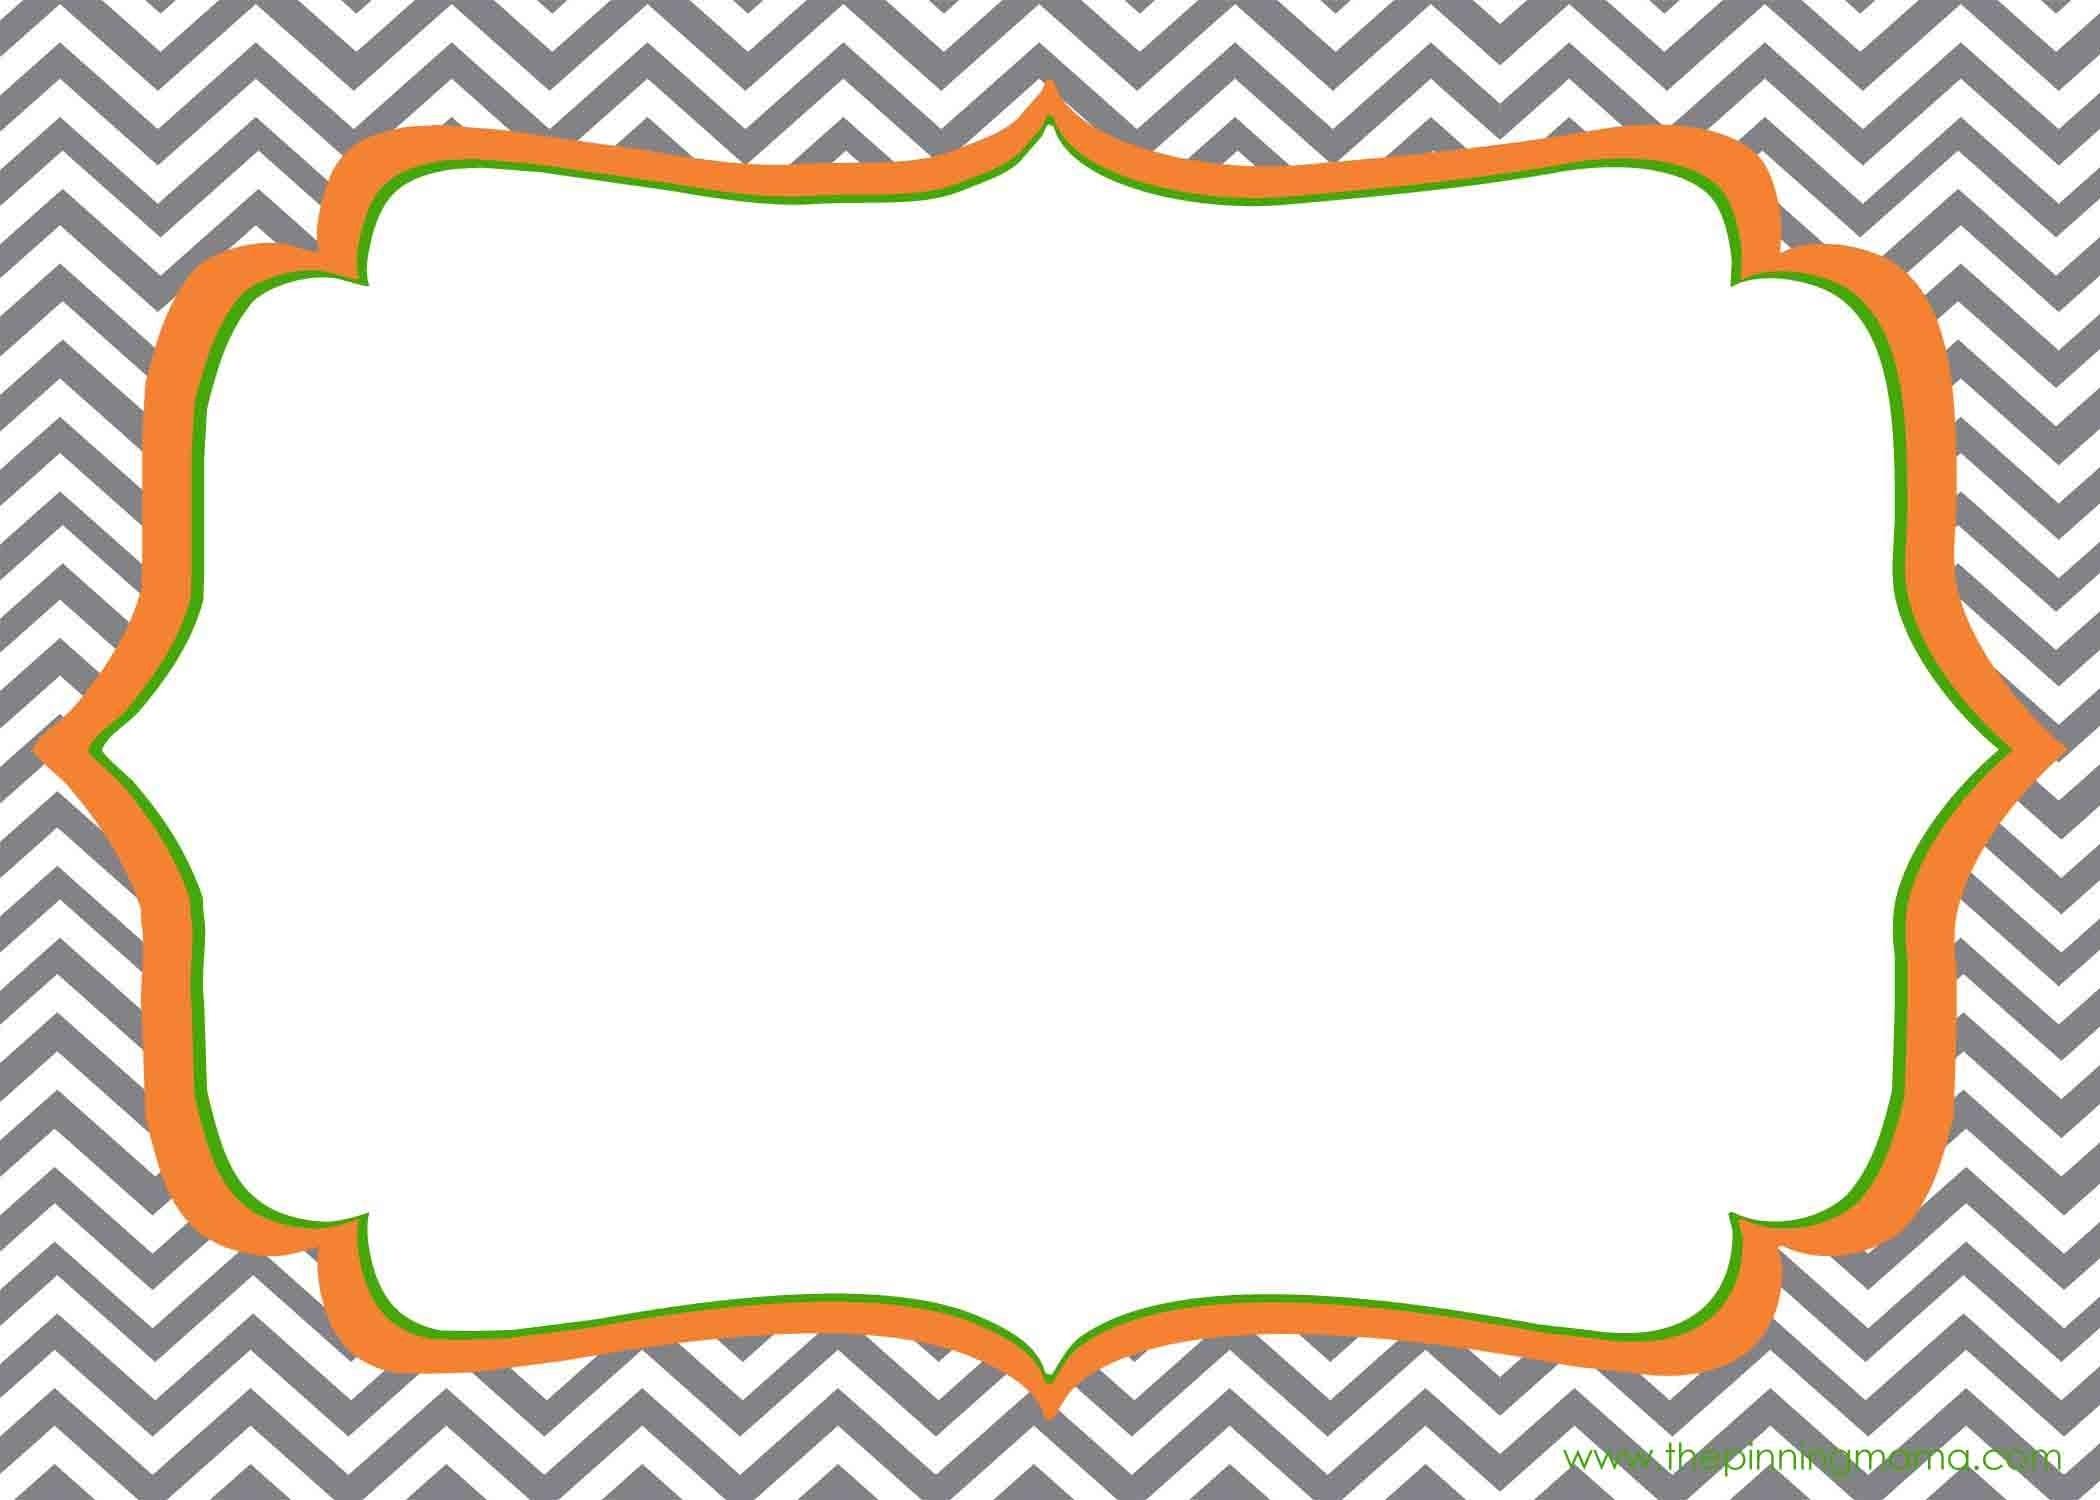 Free Printable Baby Cards Templates - Printable Cards - Free Printable Picture Cards